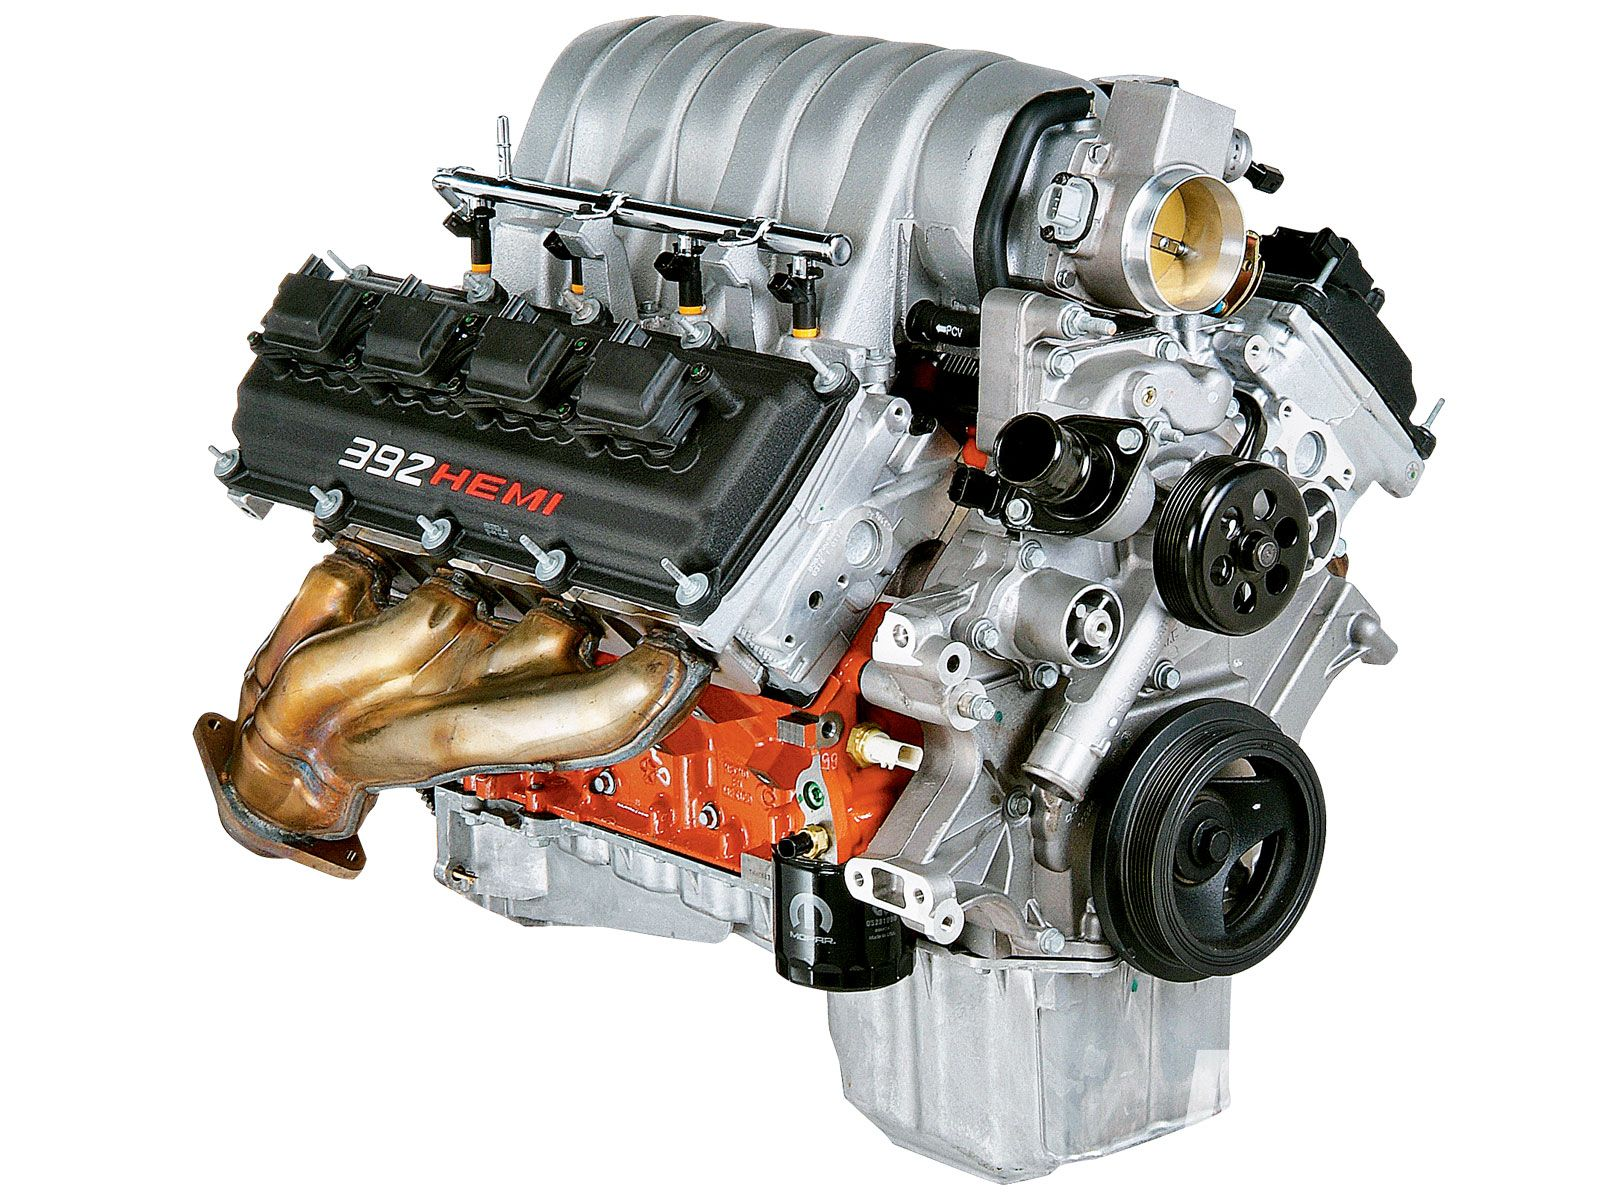 Mopar 392 Hemi Engine Mopar Pinterest Engine Hemi